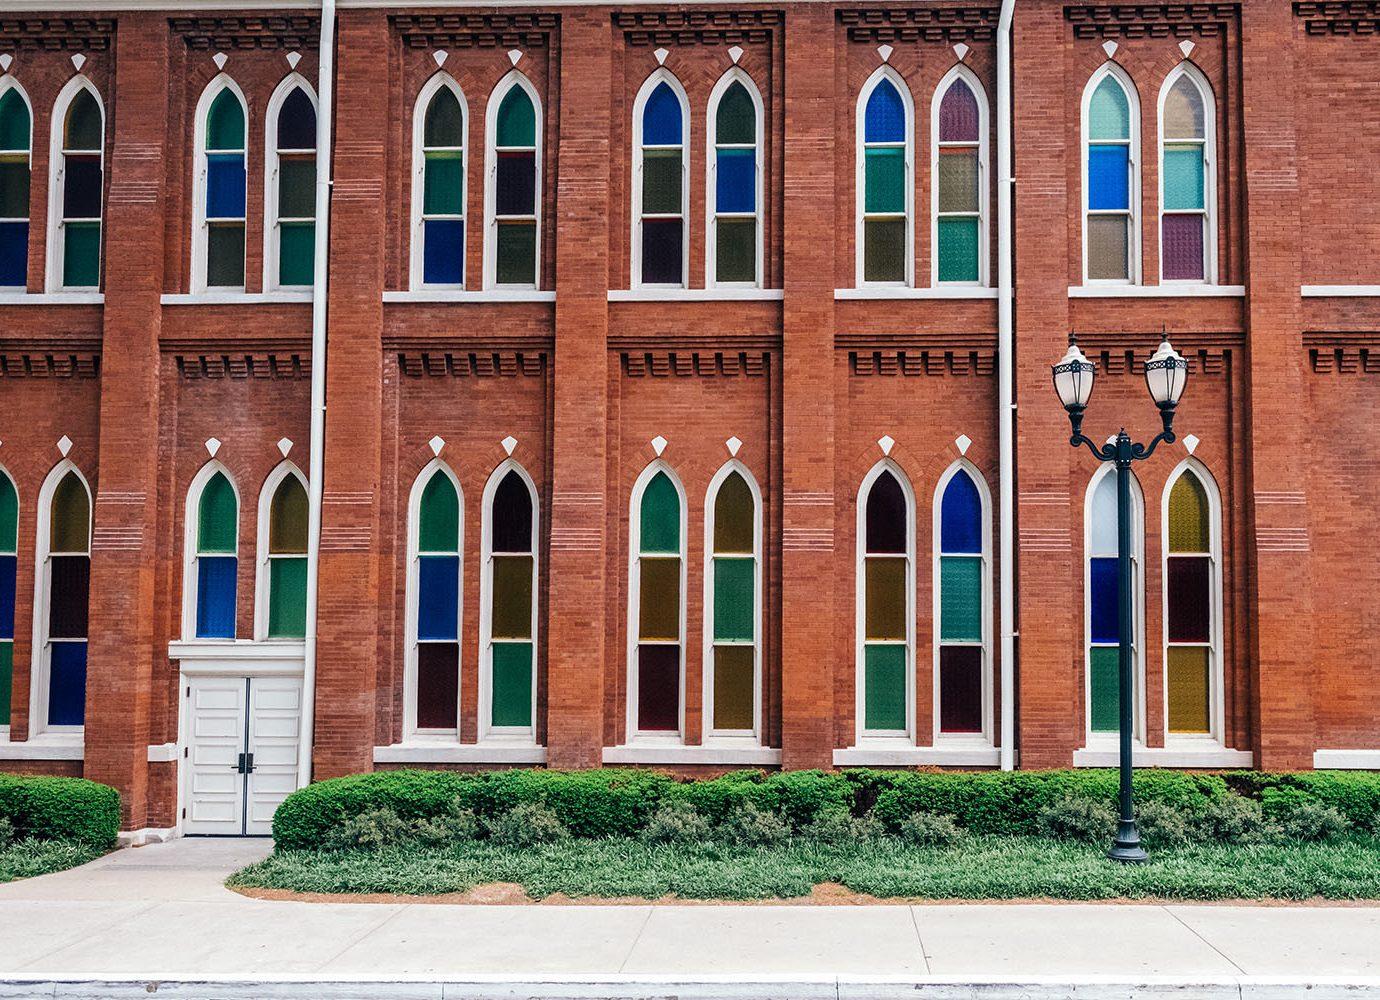 Trip Ideas building outdoor color landmark urban area Architecture neighbourhood facade window Downtown door estate old stone